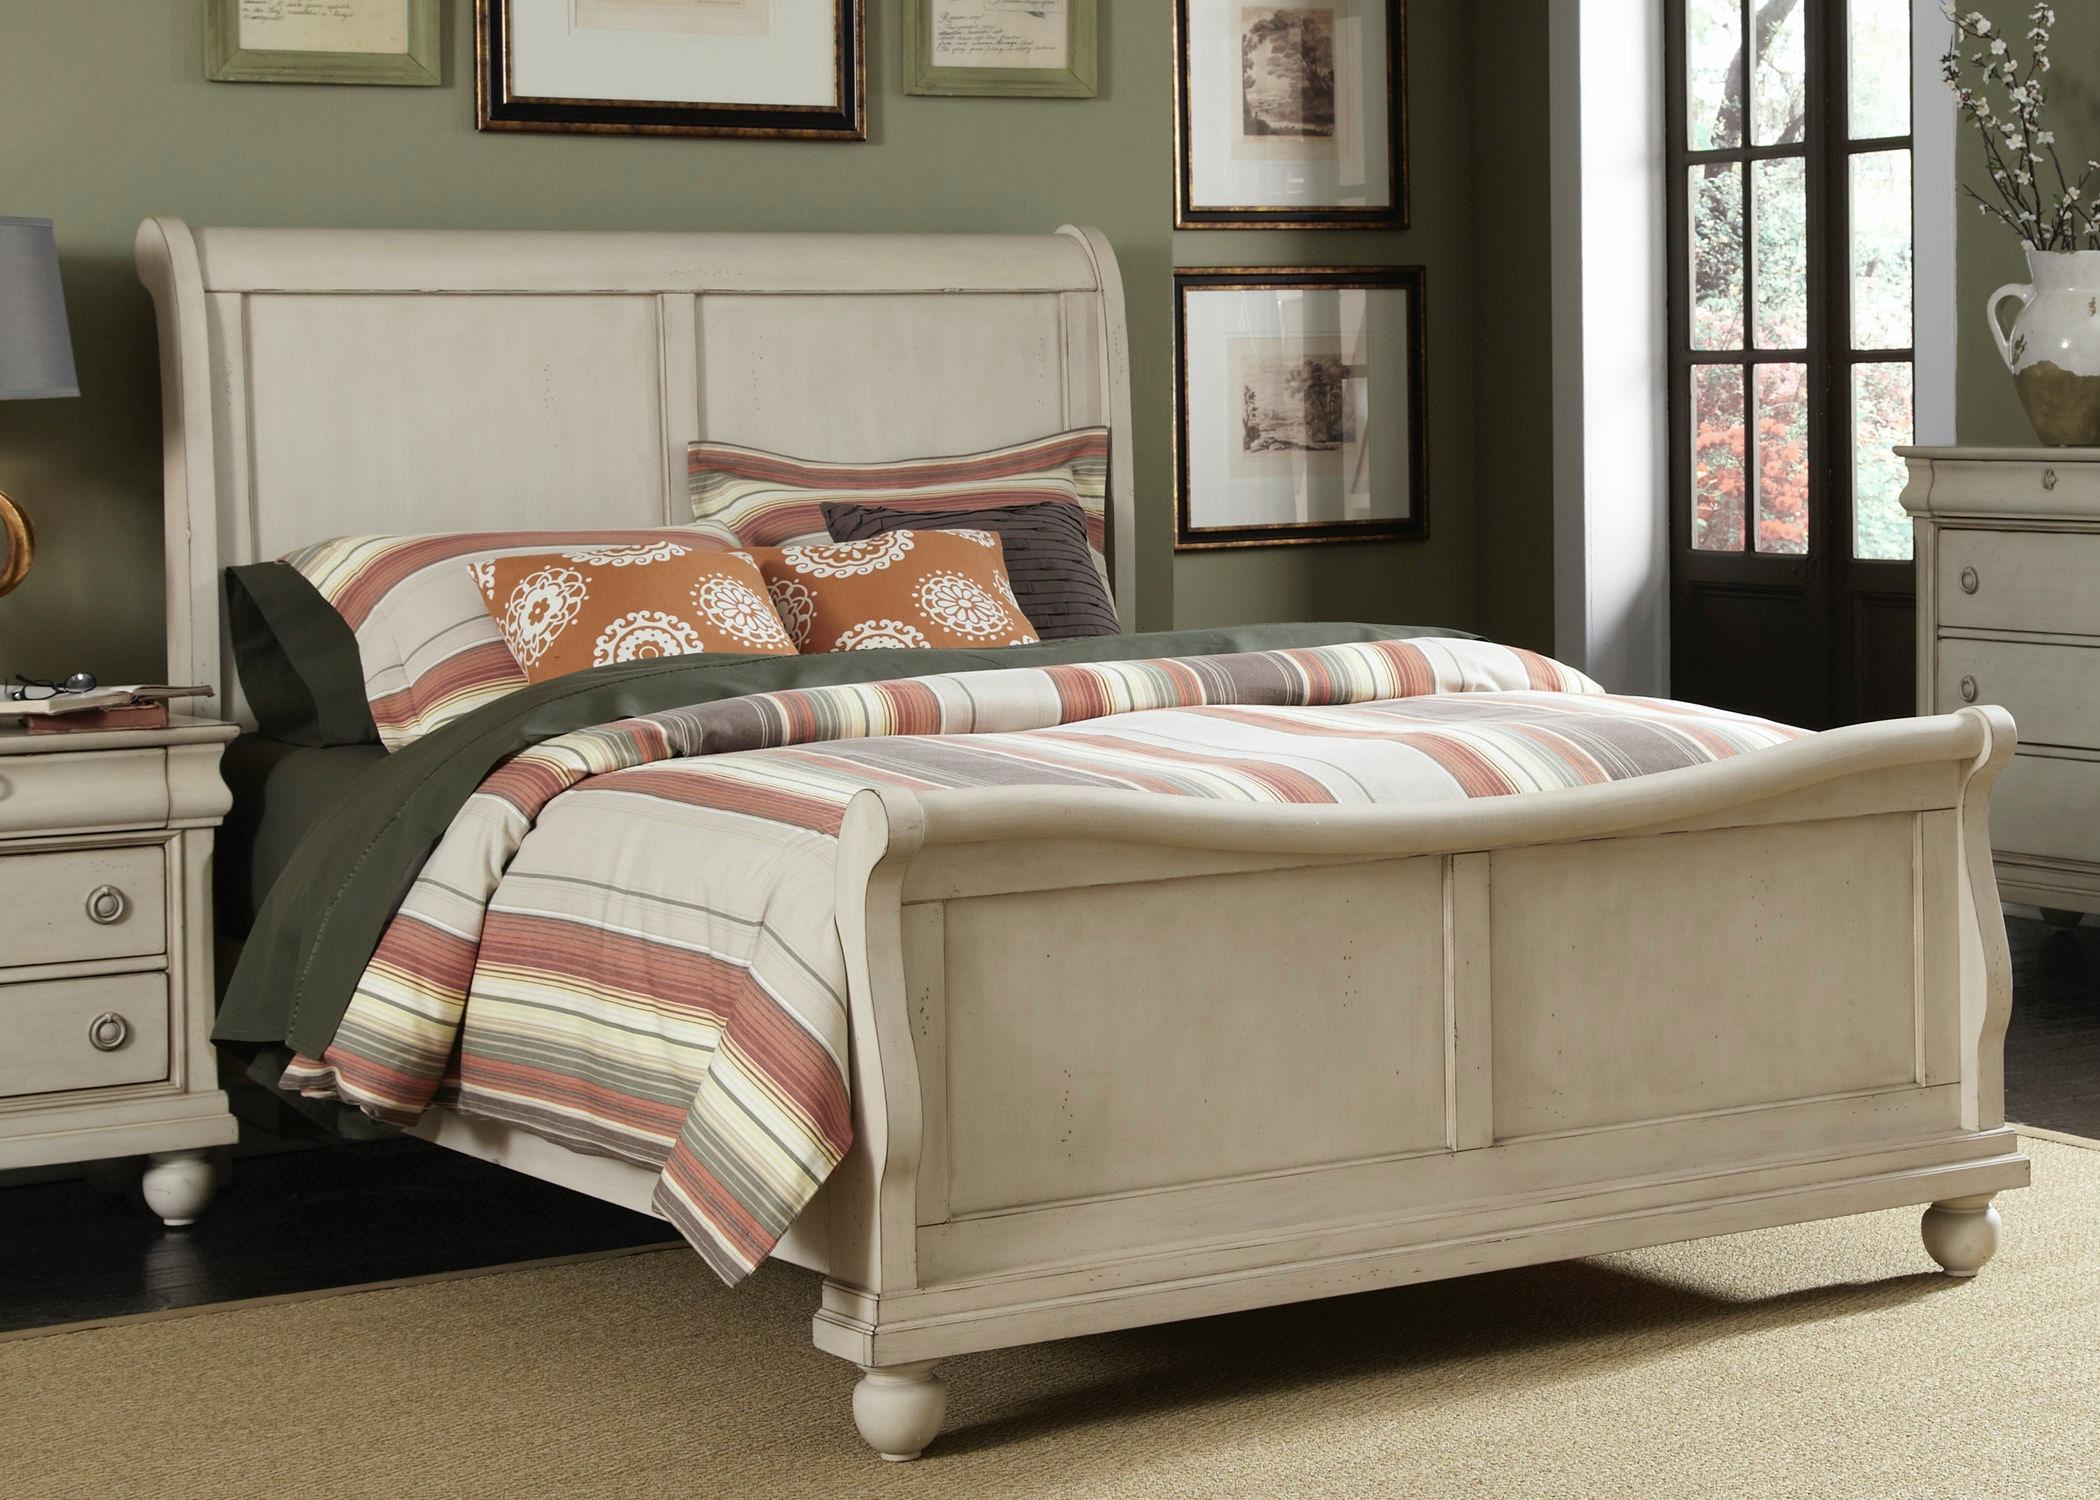 Liberty Furniture Queen Sleigh Headboard 689 BR21H